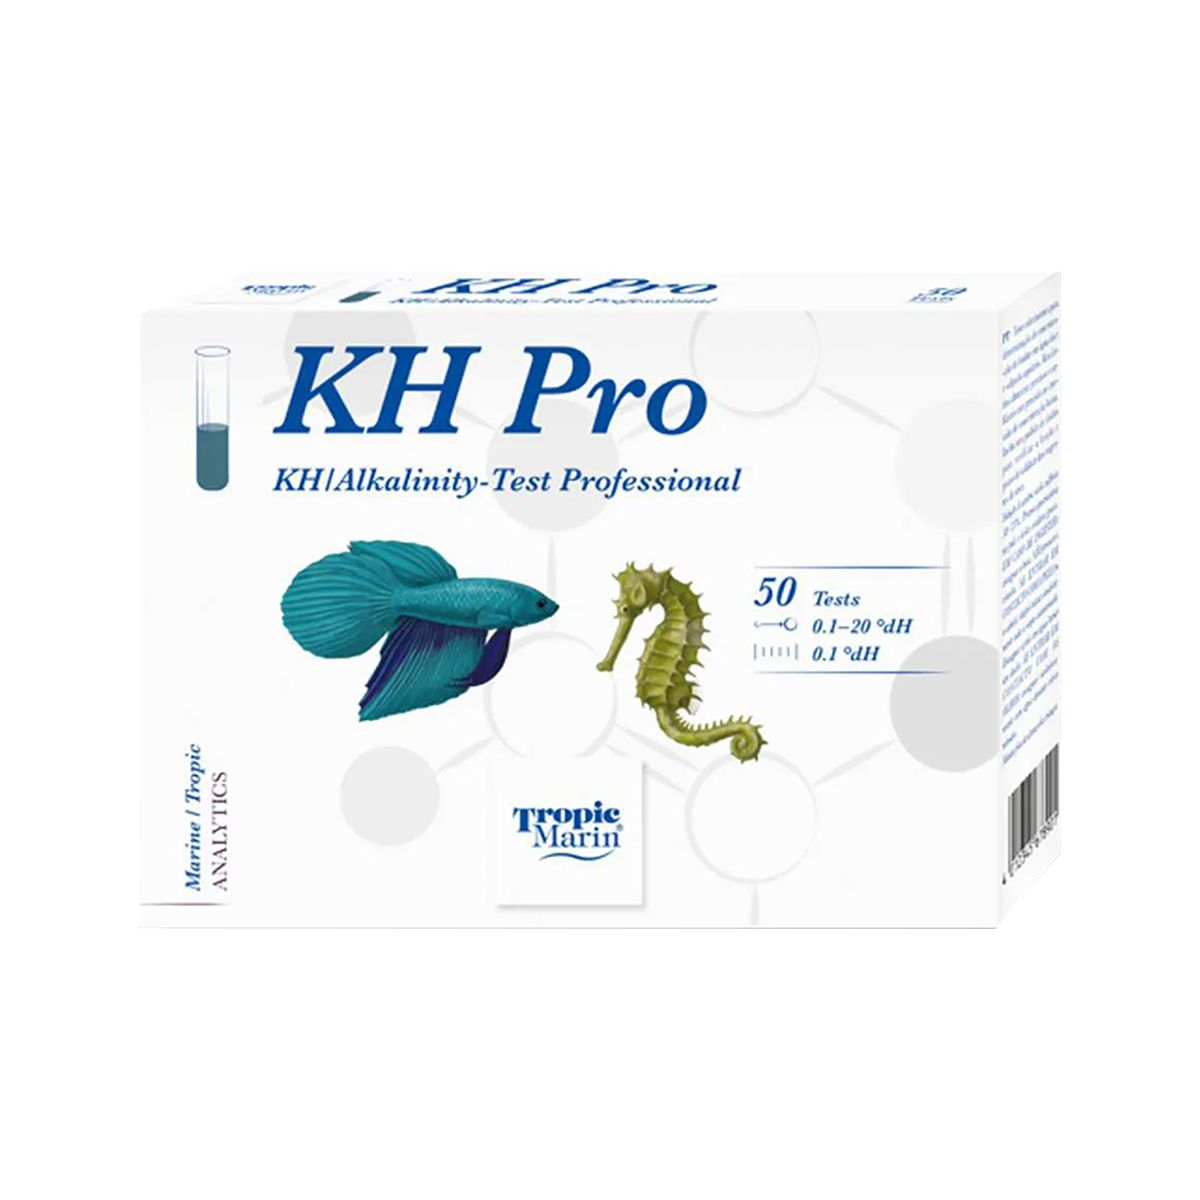 Tropic Marin Teste De Kh - Alkalinity Profissional